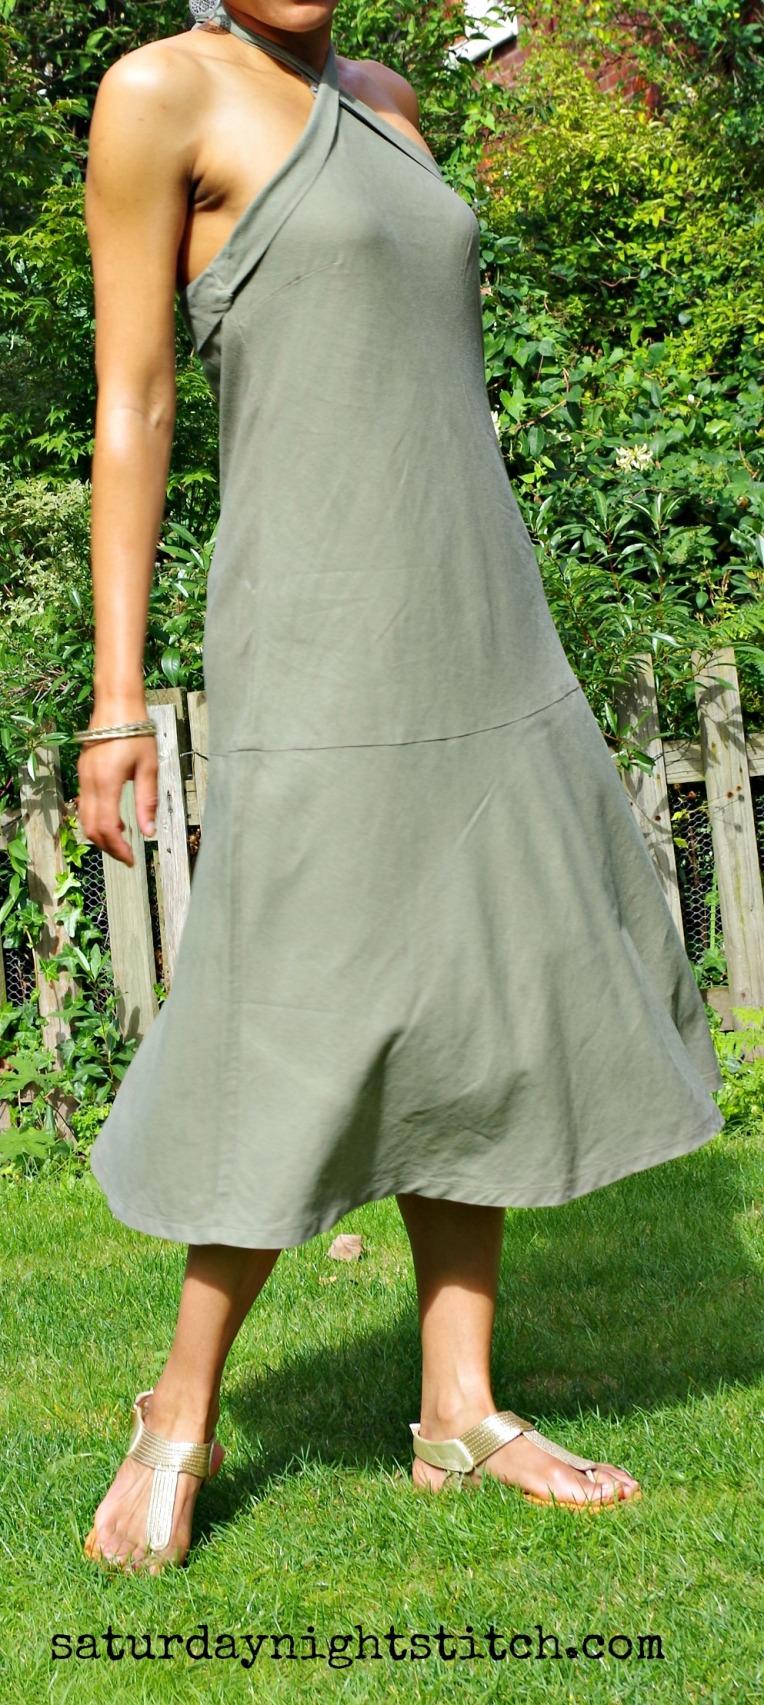 Blog pictures annad dresses etc 371